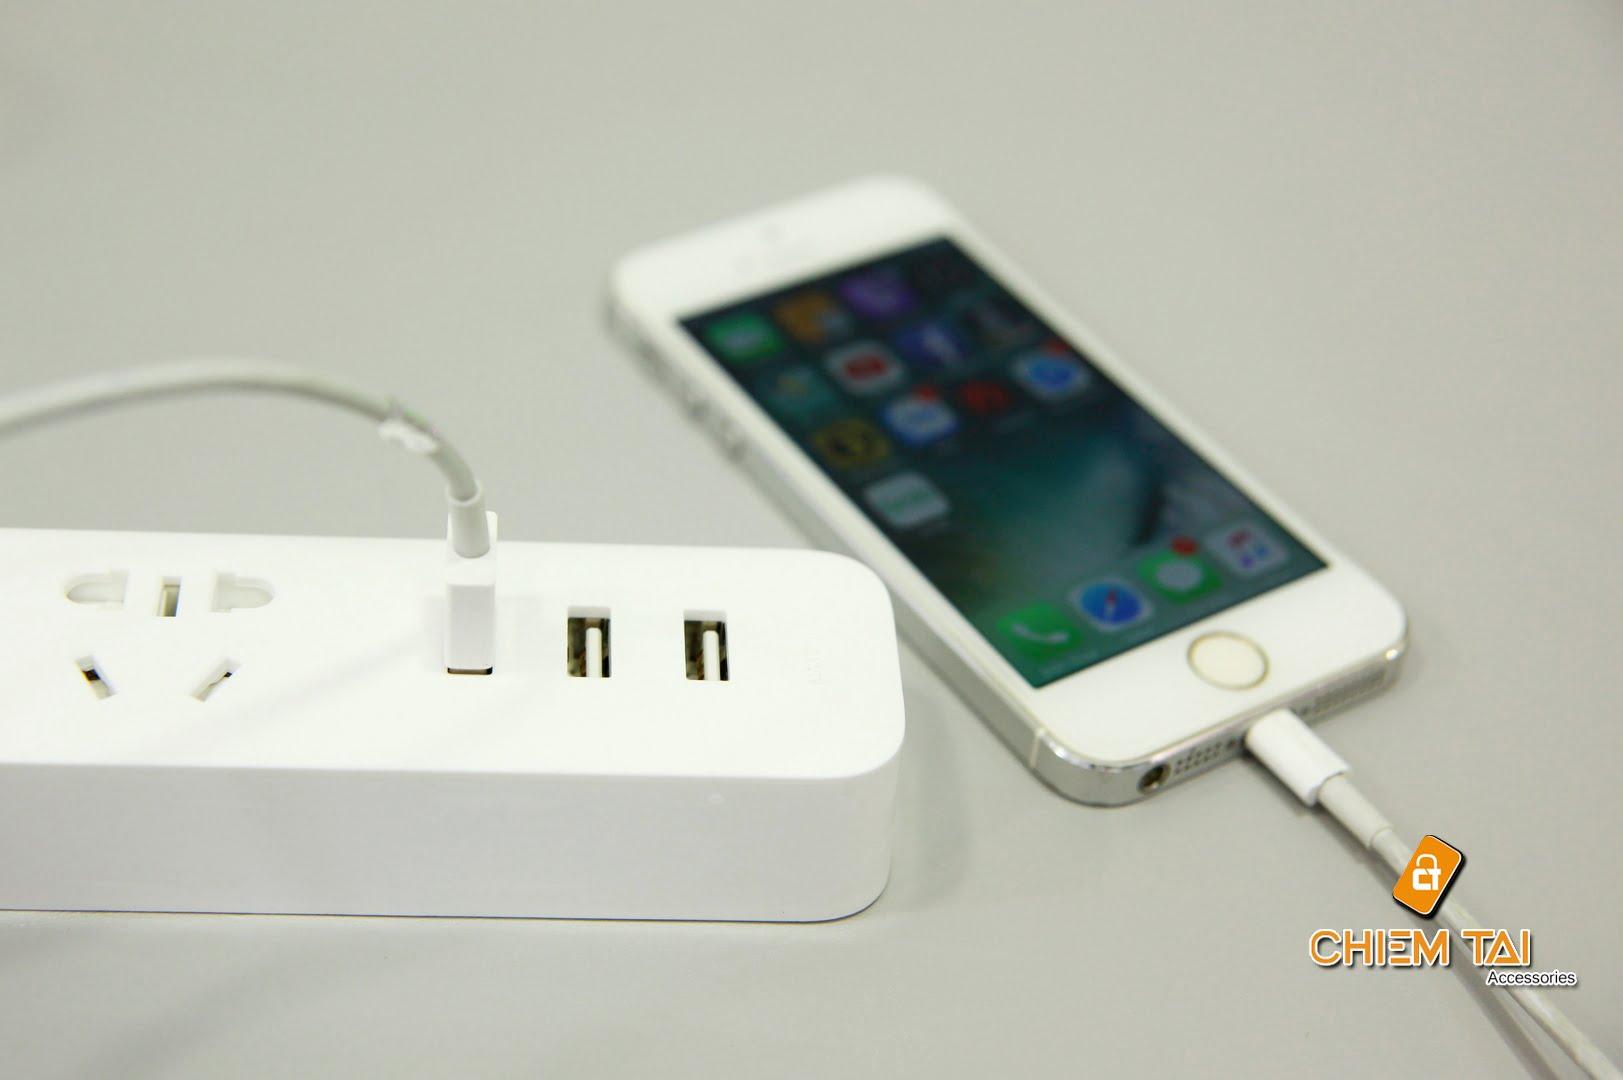 o cam dien mi smart powerstrip 3 usb ket noi wifi 60126d00c6bc2